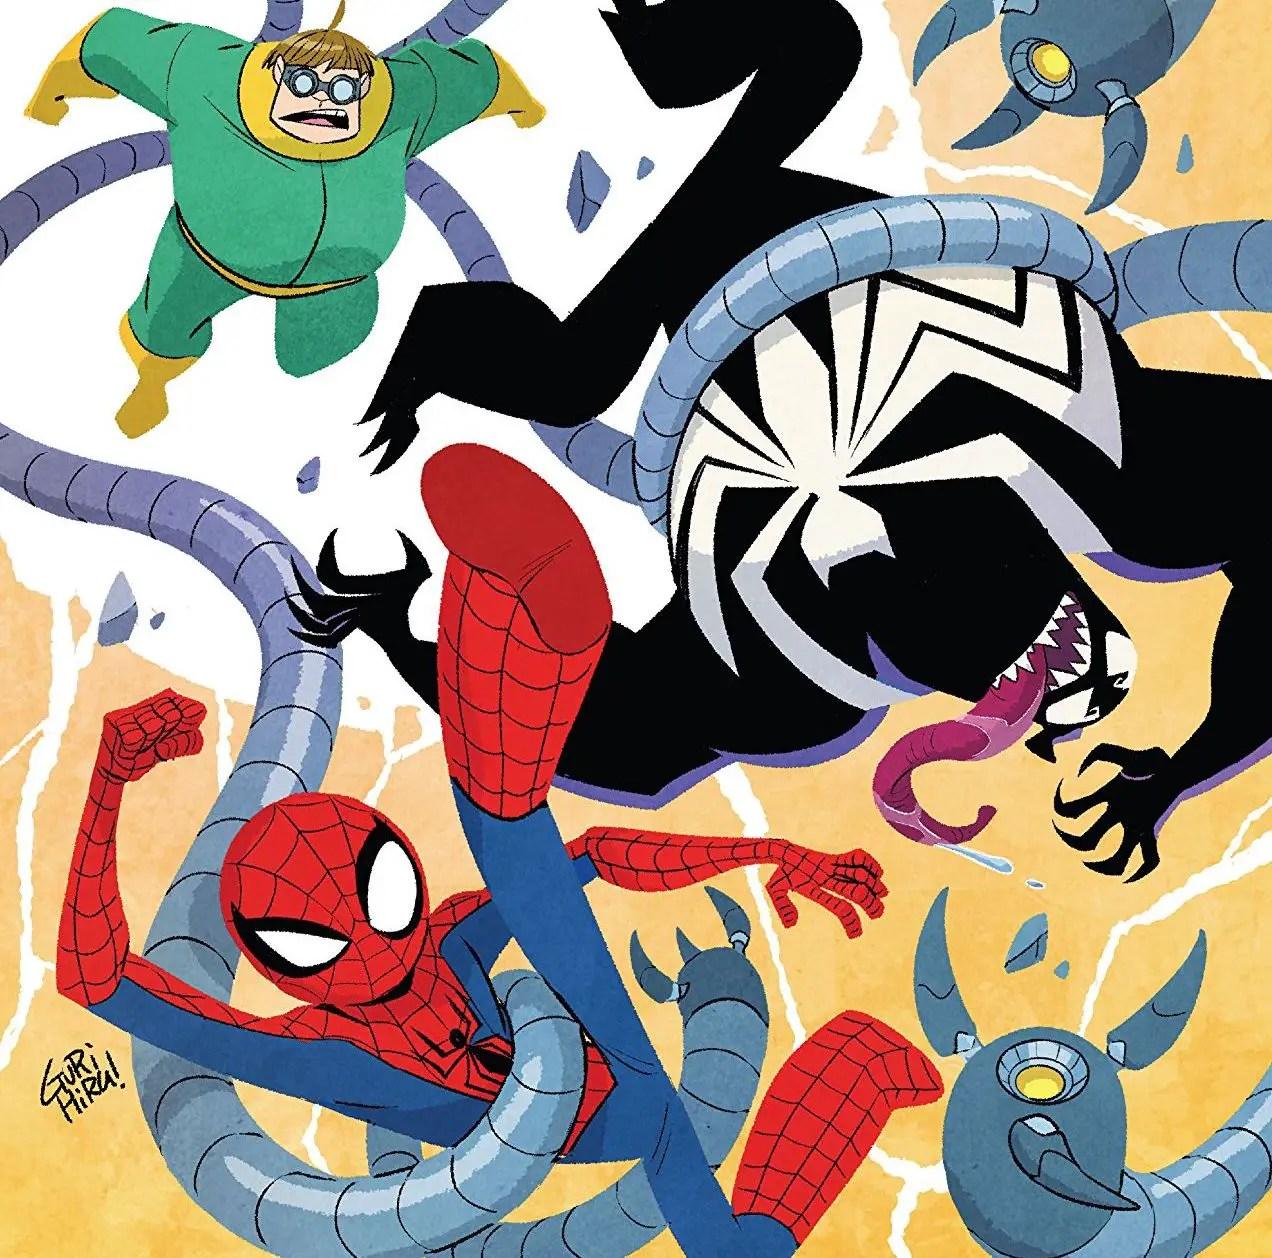 Spider-Man & Venom: Double Trouble #4 Review